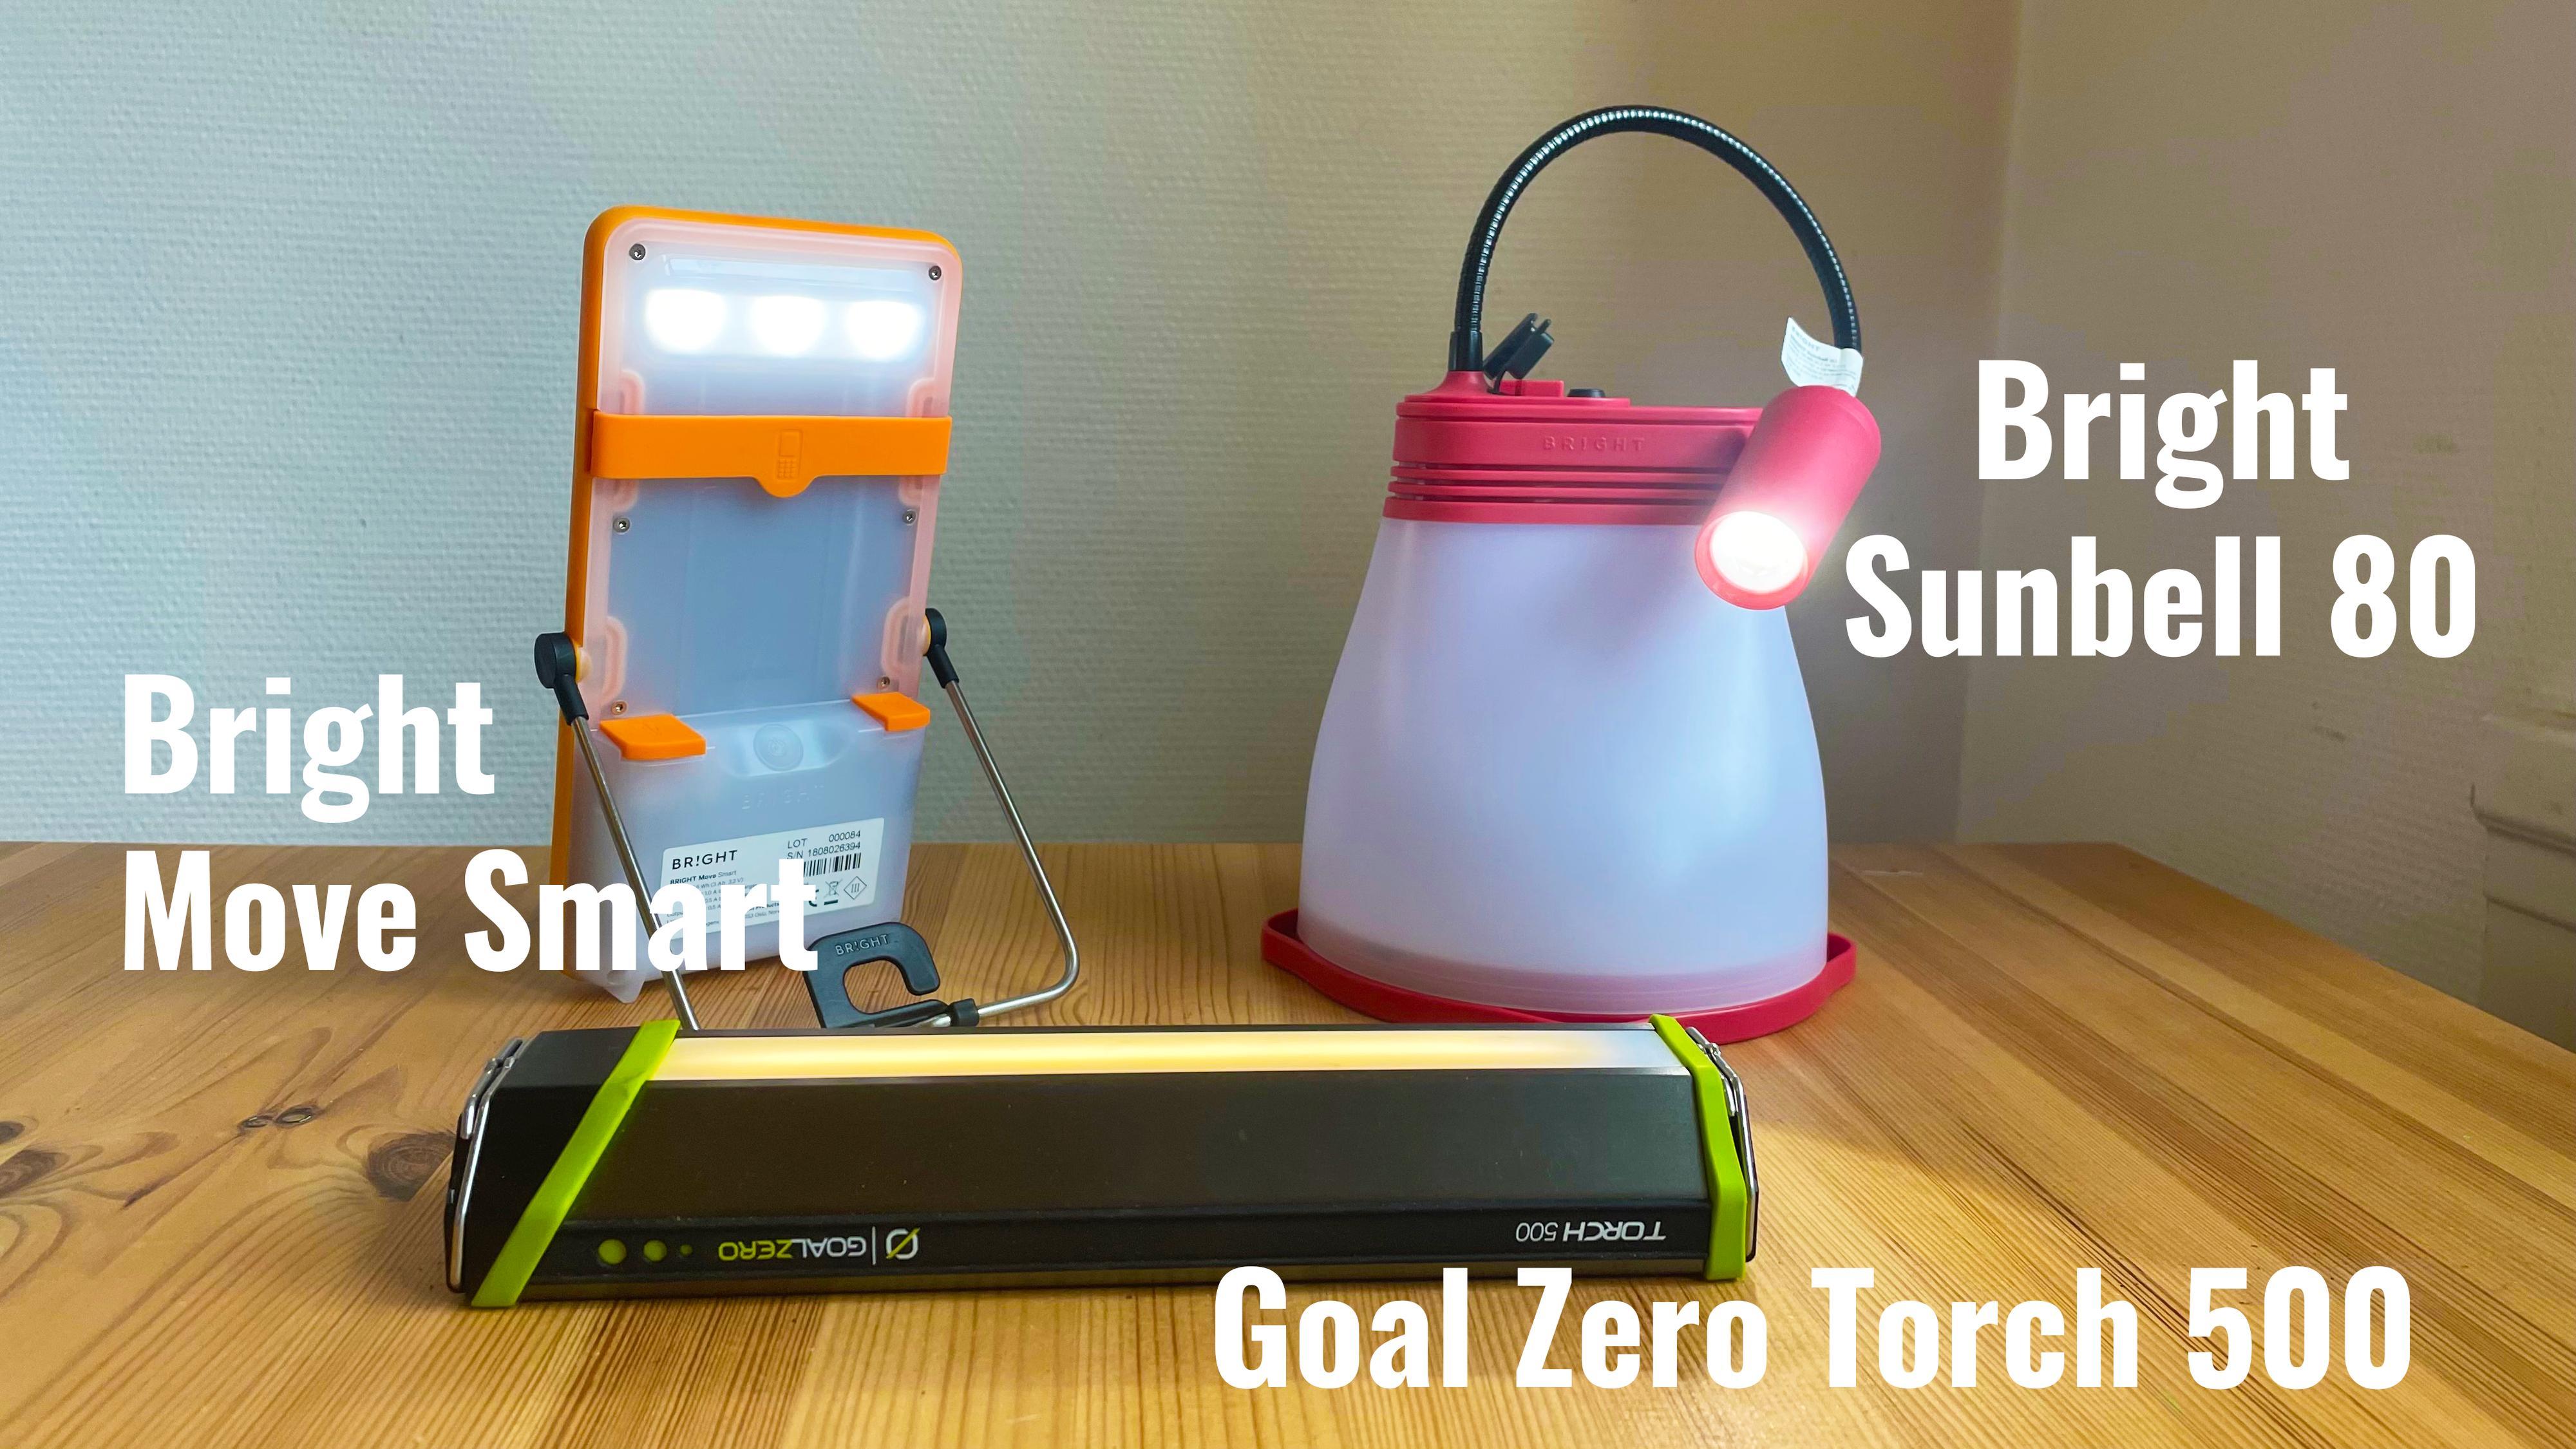 Bright Move Smart, Goal Zero Torch 500 og Bright Sunbell 80